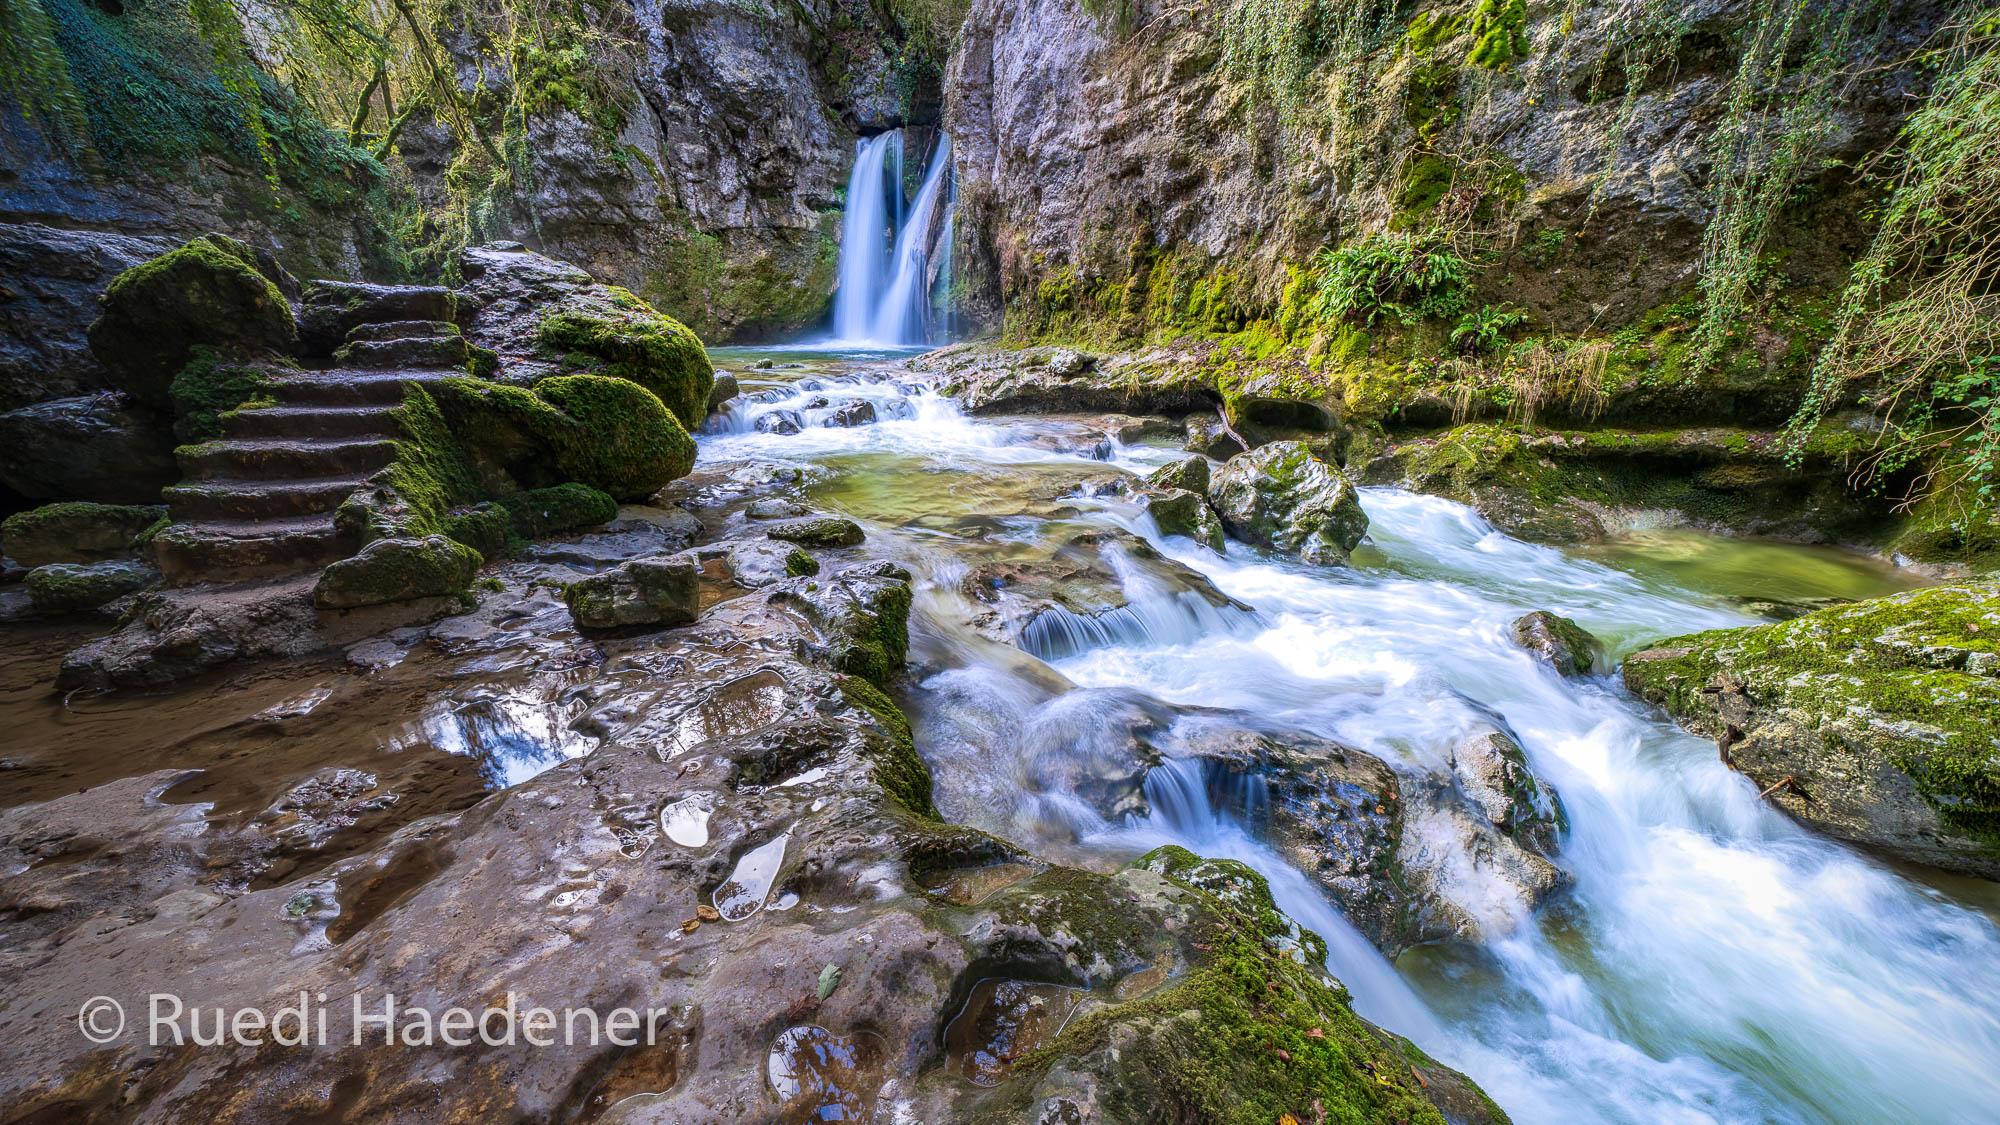 Wasserfall im Kanton Waadt